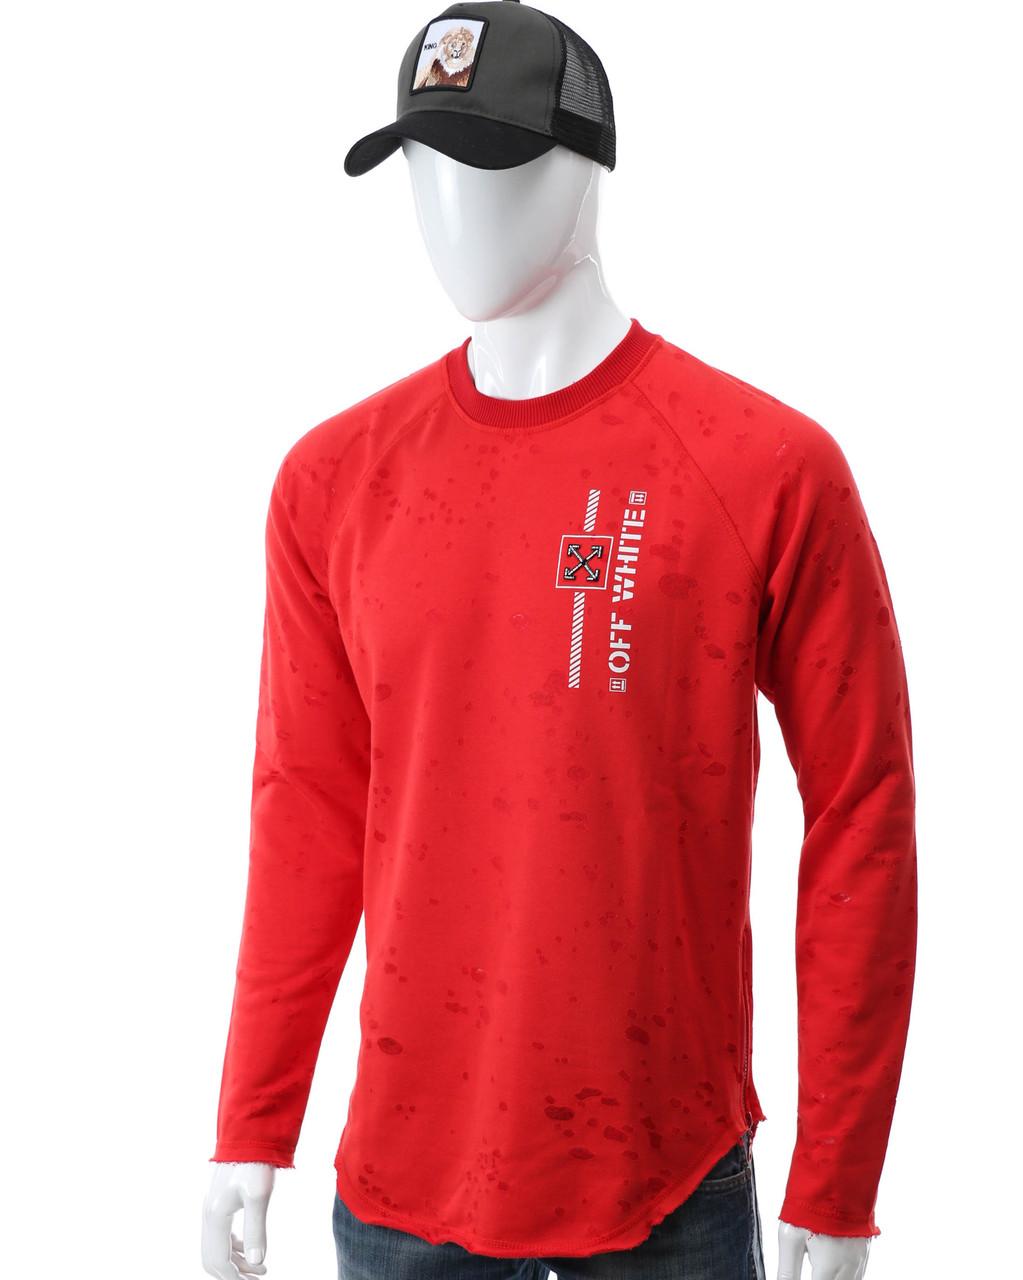 Свитшот красный OFF-WHITE #10 Р-2 RED L(Р) 20-516-212-004